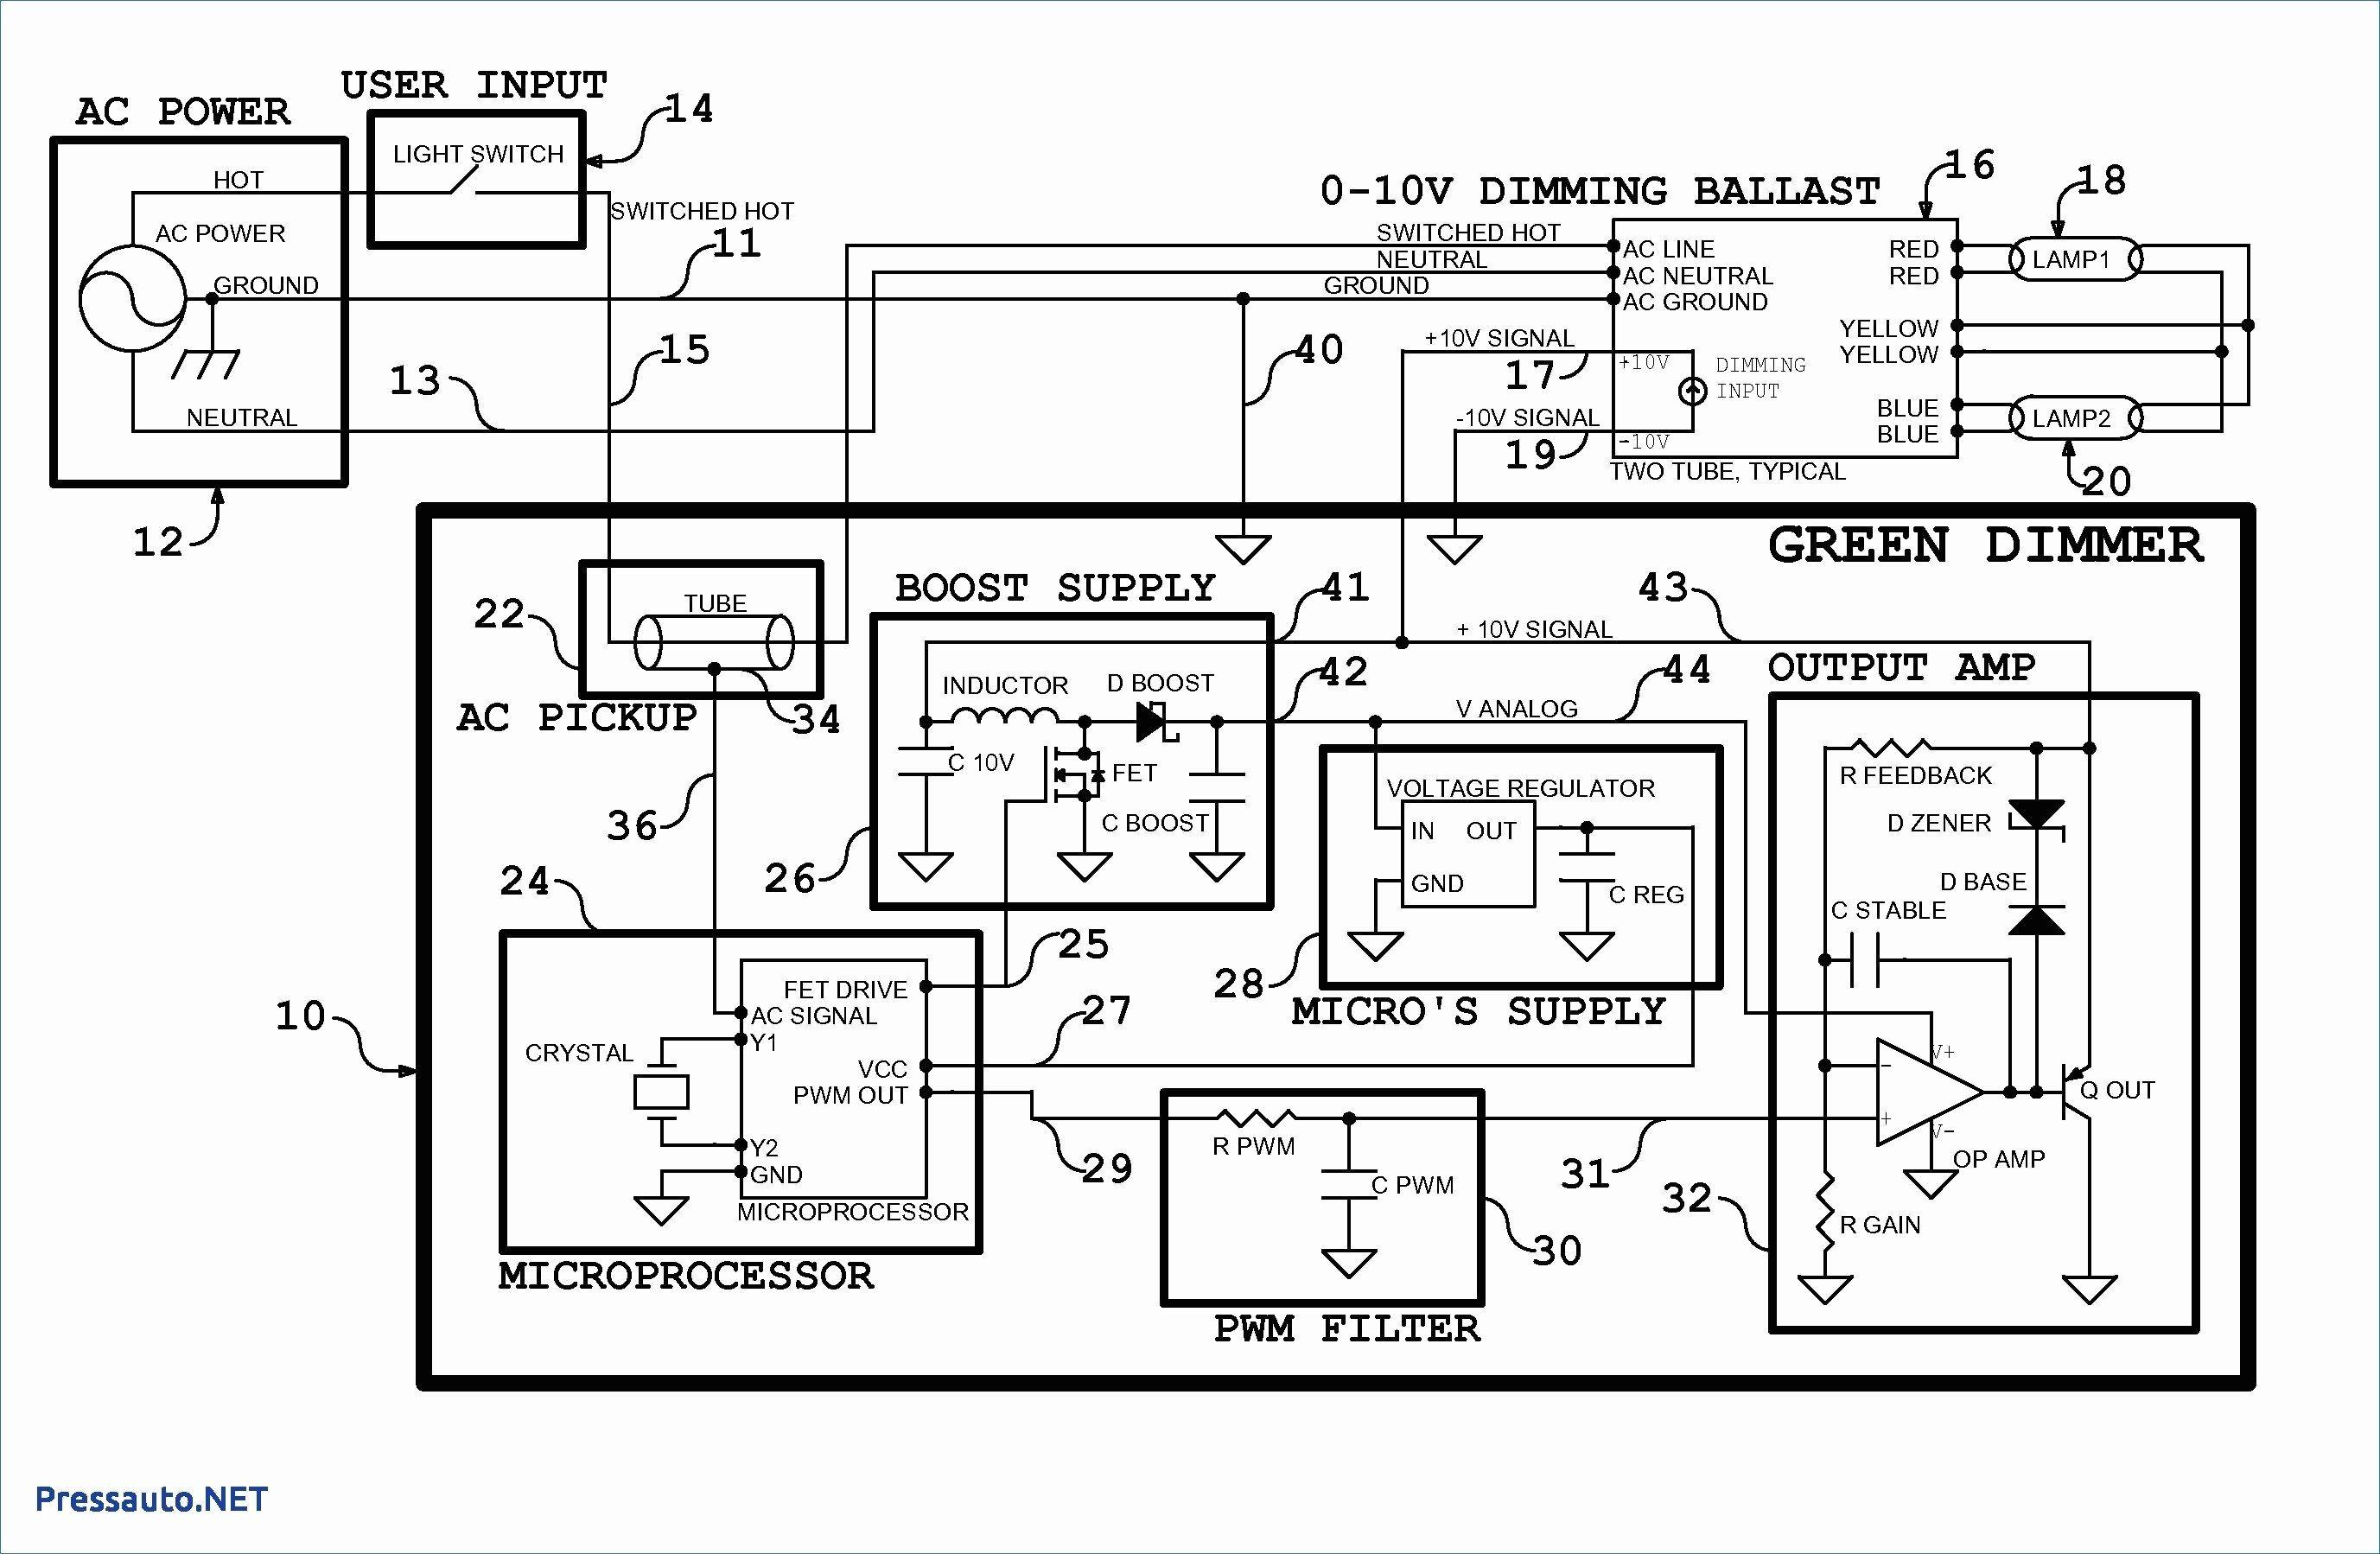 0 10 Dimming Ballast Wiring Diagram | Wiring Diagram - 0-10 Volt Dimming Wiring Diagram